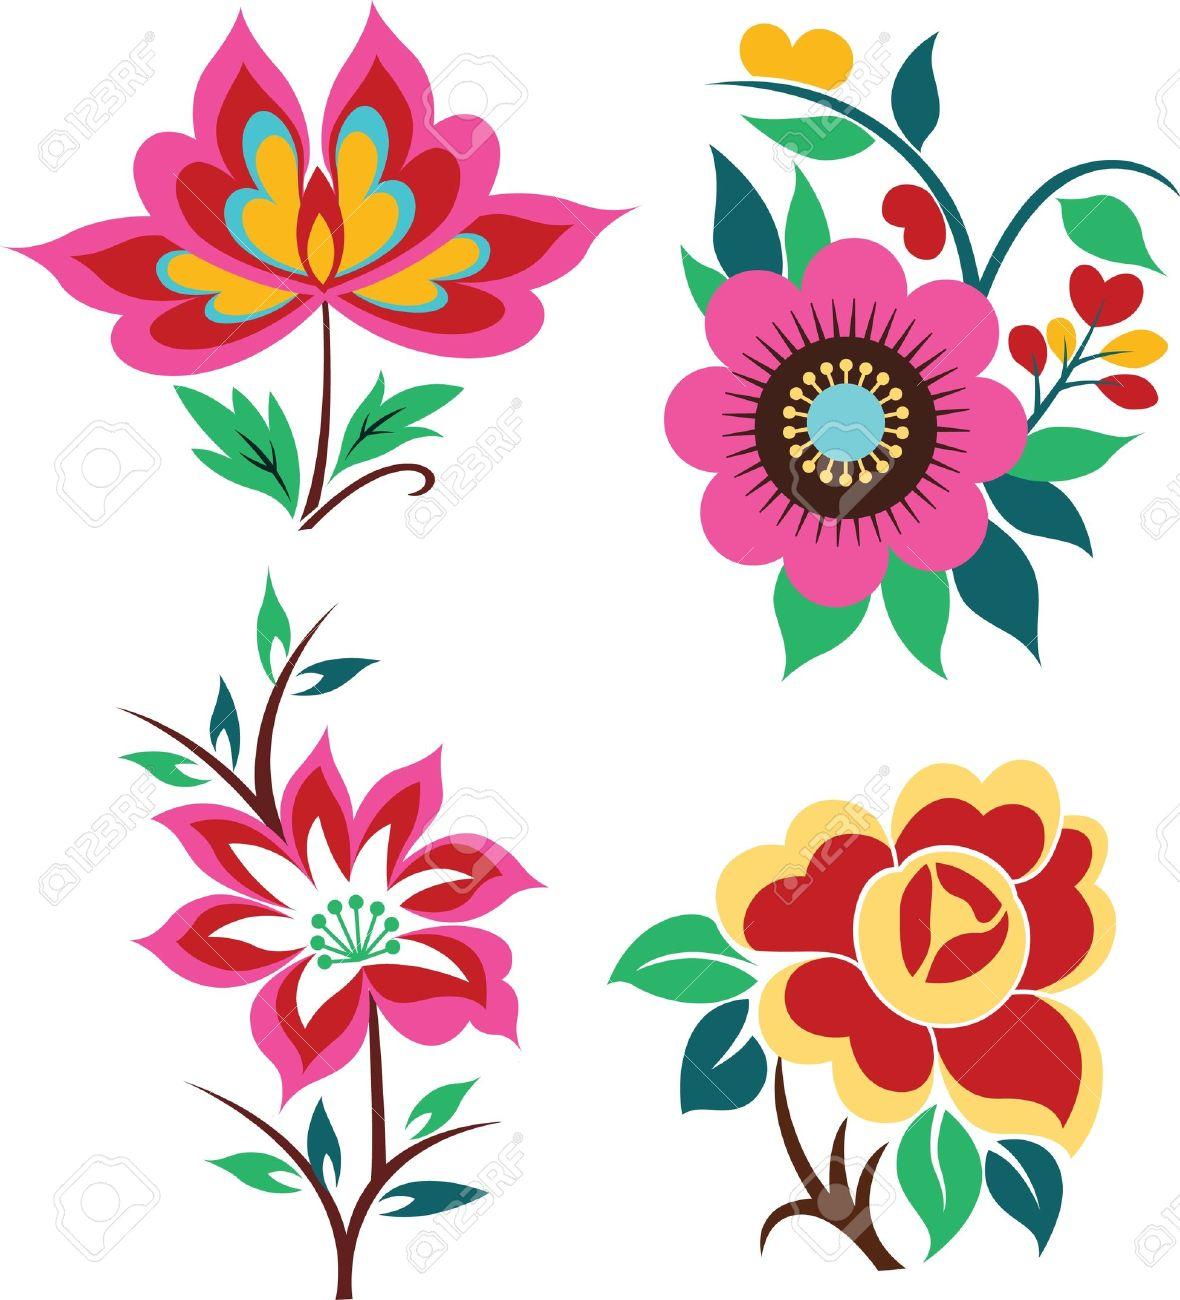 Floral graphic designs clip art freeuse download Graphic flower designs - ClipartFest clip art freeuse download